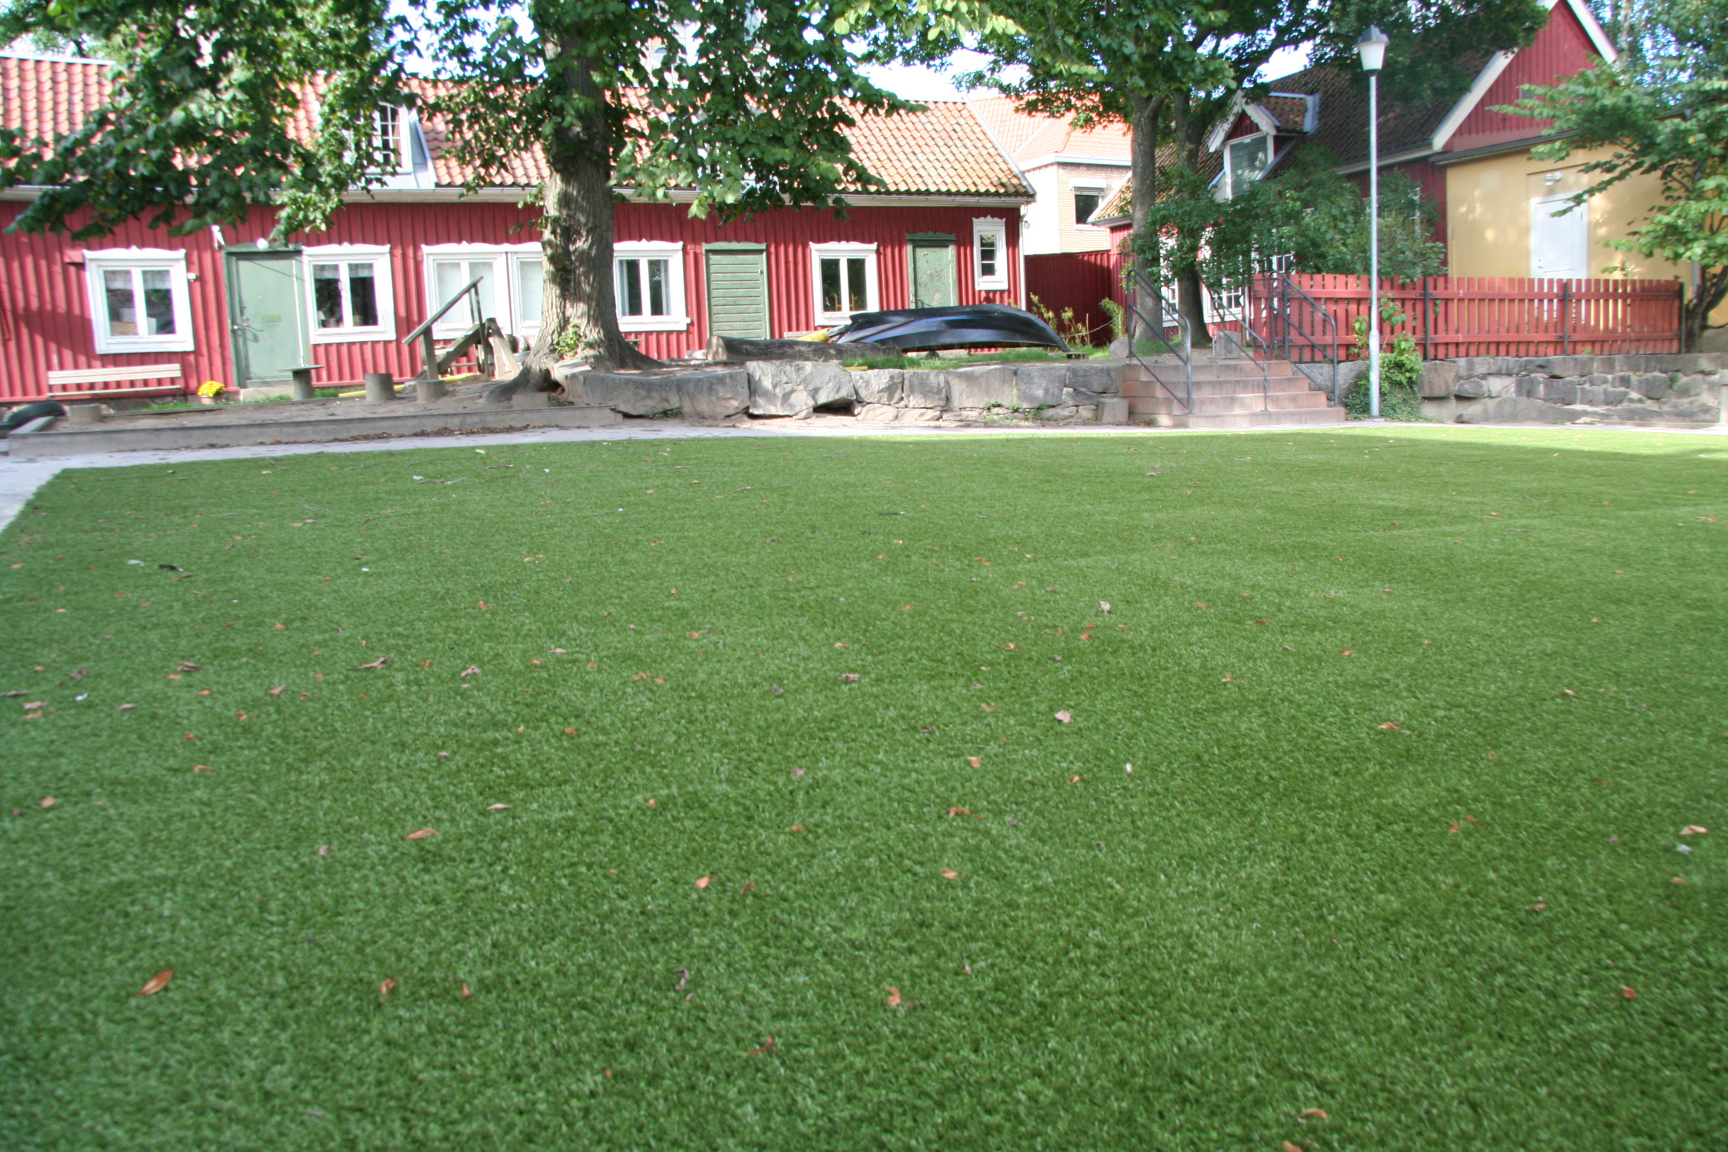 kunstgress fellesareal park gressmatte unisport